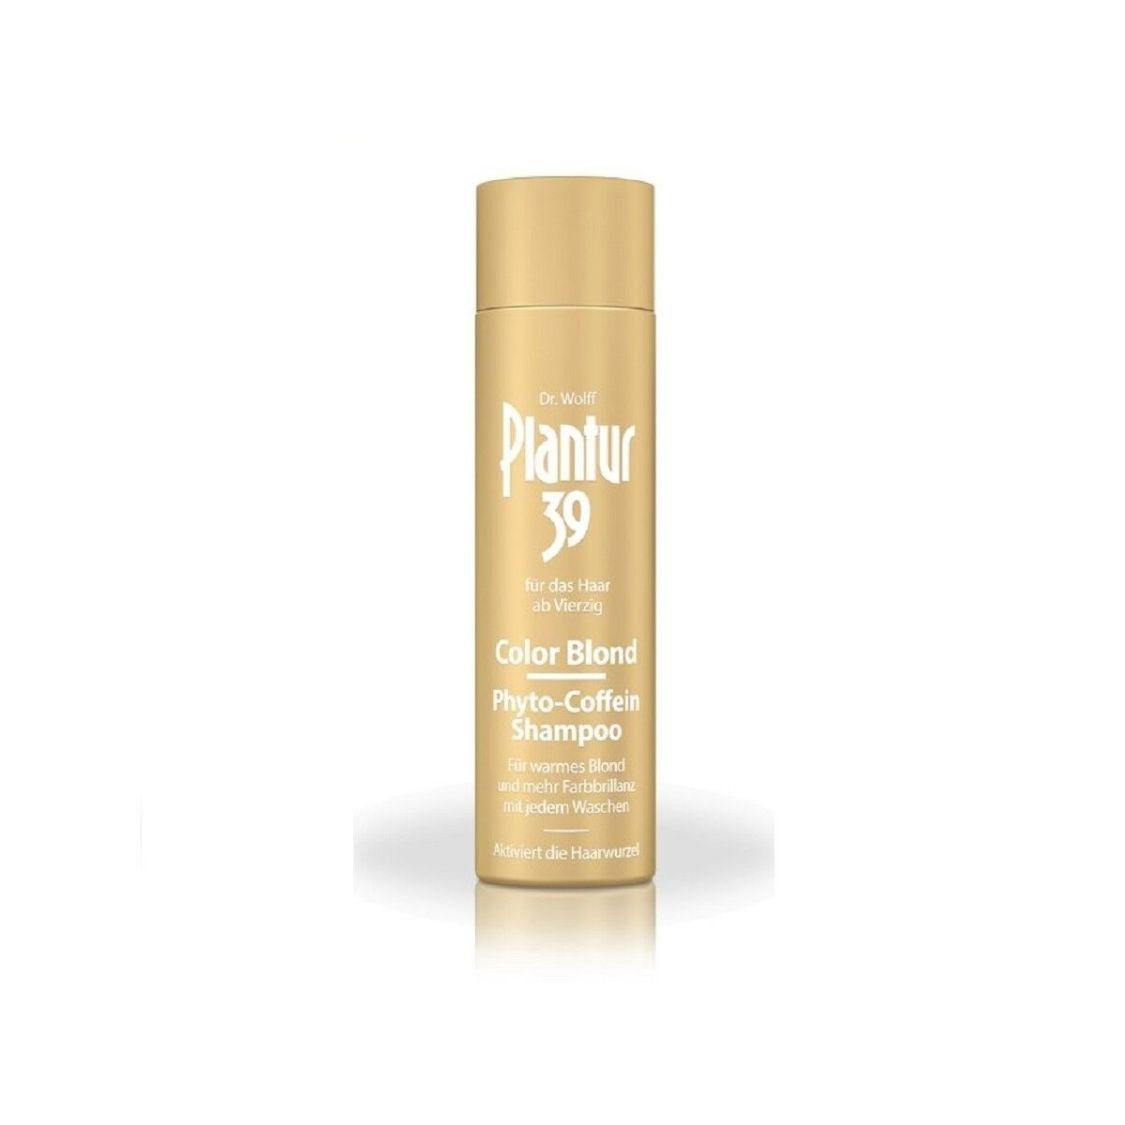 Alcina Plantur 39 Color Blond Phyto-Coffein Shampoo 250 ml